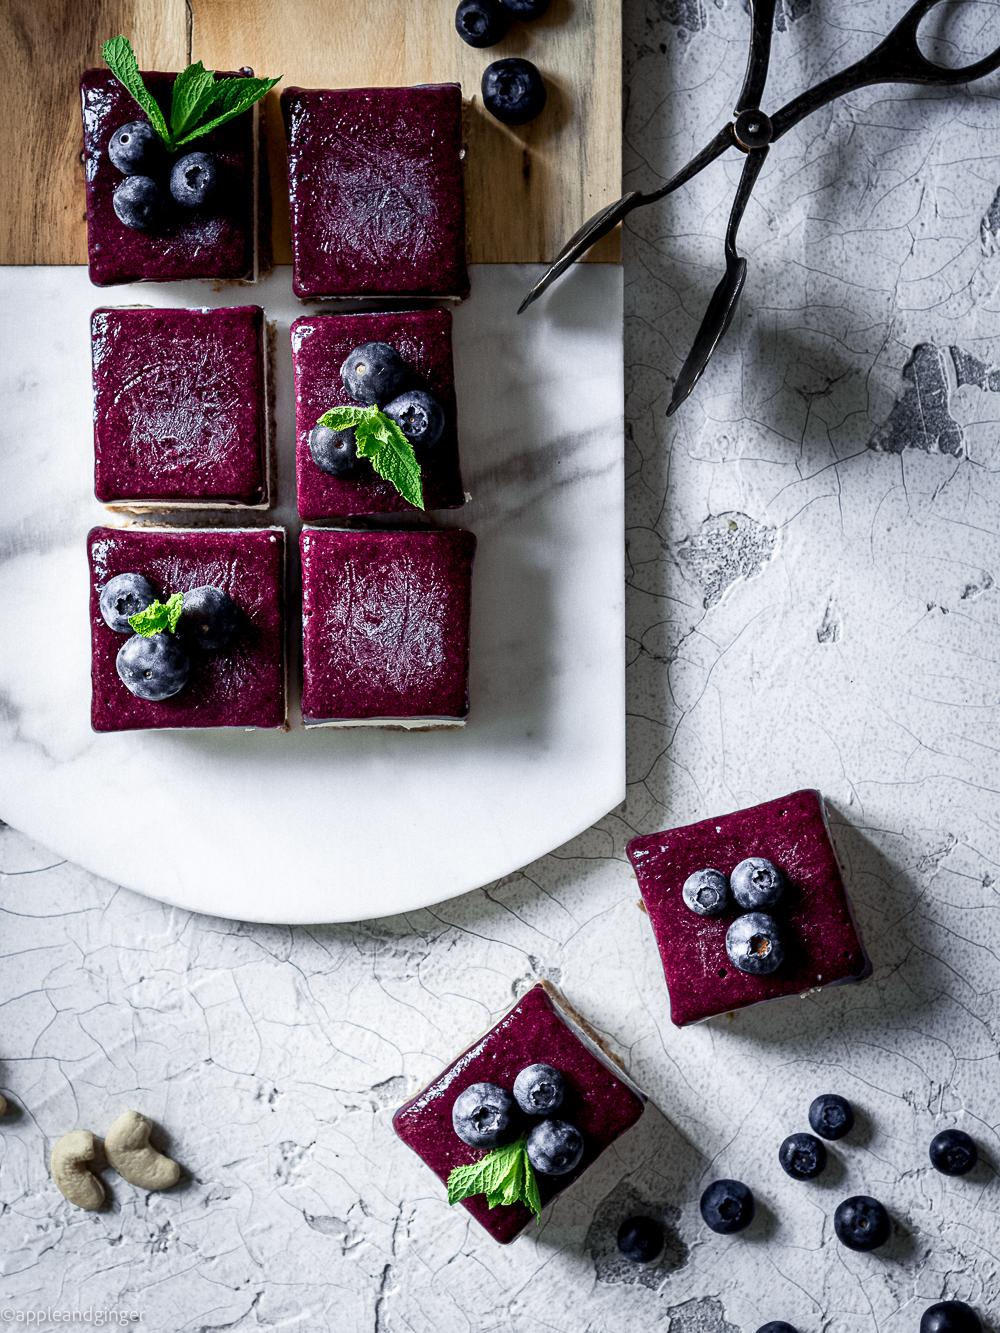 Kokos-Heidelbeer-Raw-Cake in Nahaufnahme